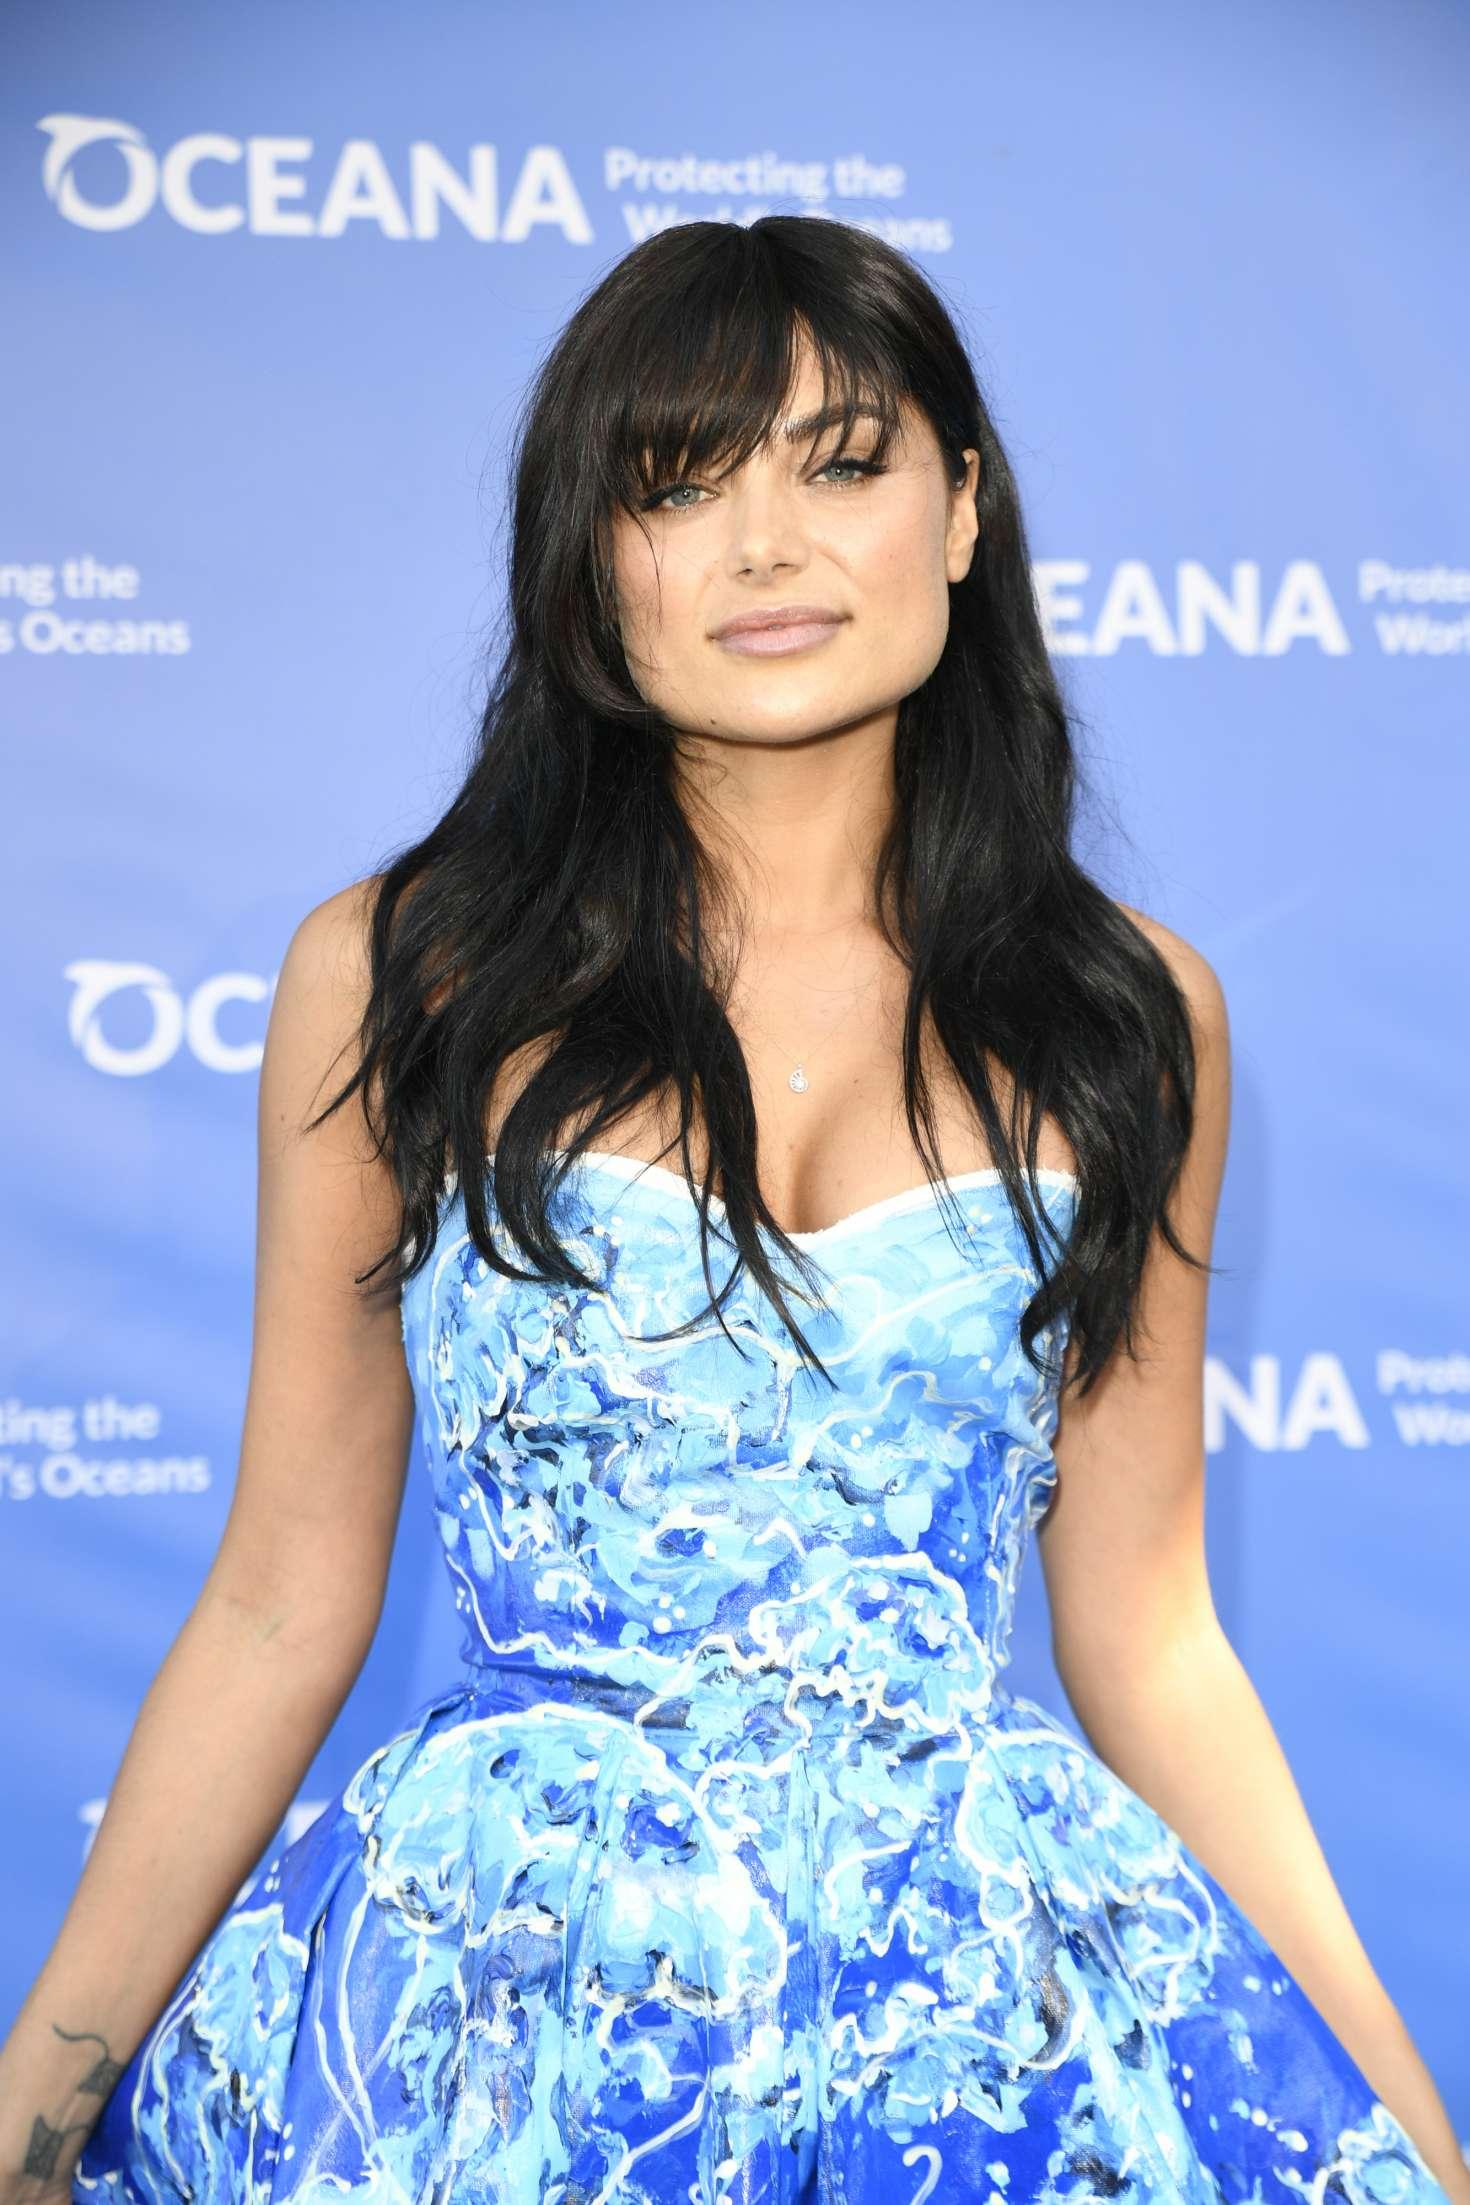 Christina Ochoa - Oceana SeaChange Summer Party in Los Angeles Megan Fox New